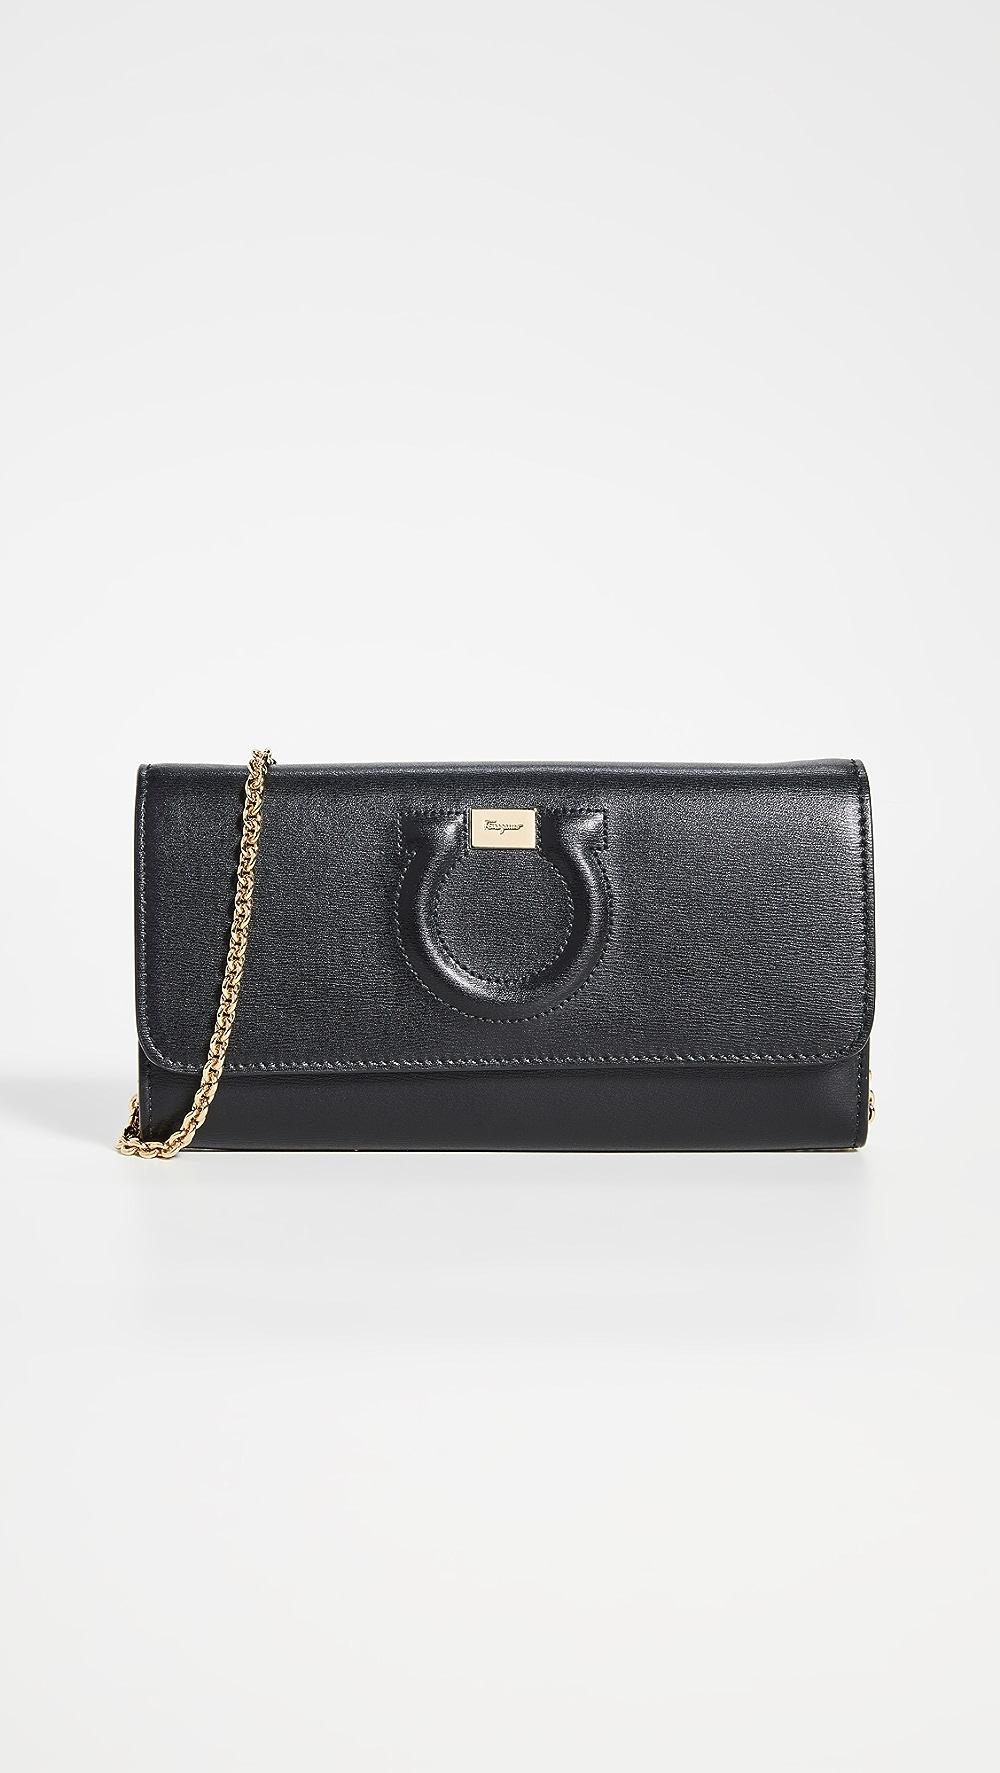 Provided Salvatore Ferragamo - Gancio City Mini Bag Yet Not Vulgar